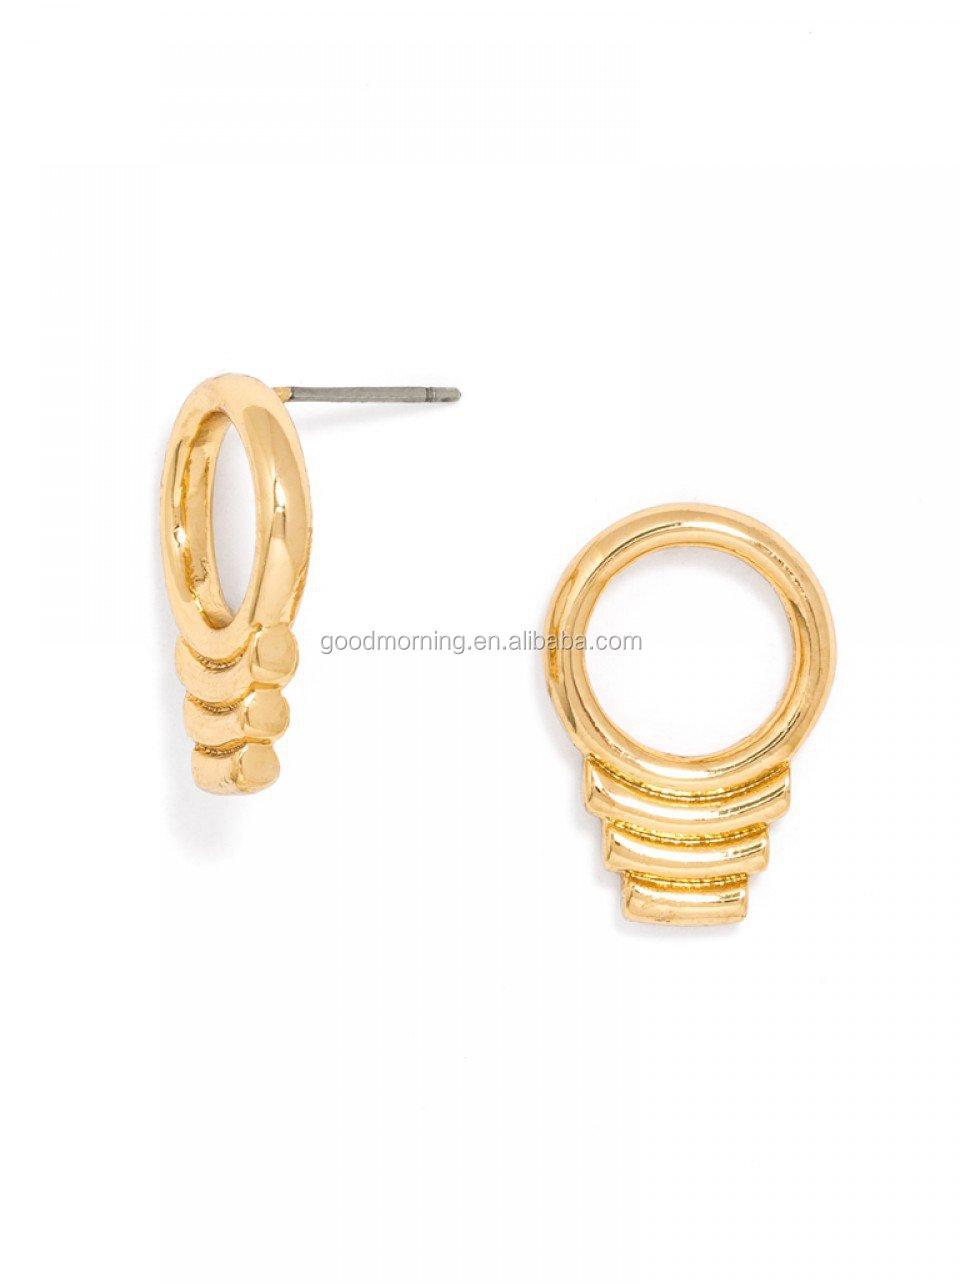 Monogram Acrylic Disc Blanks Earrings